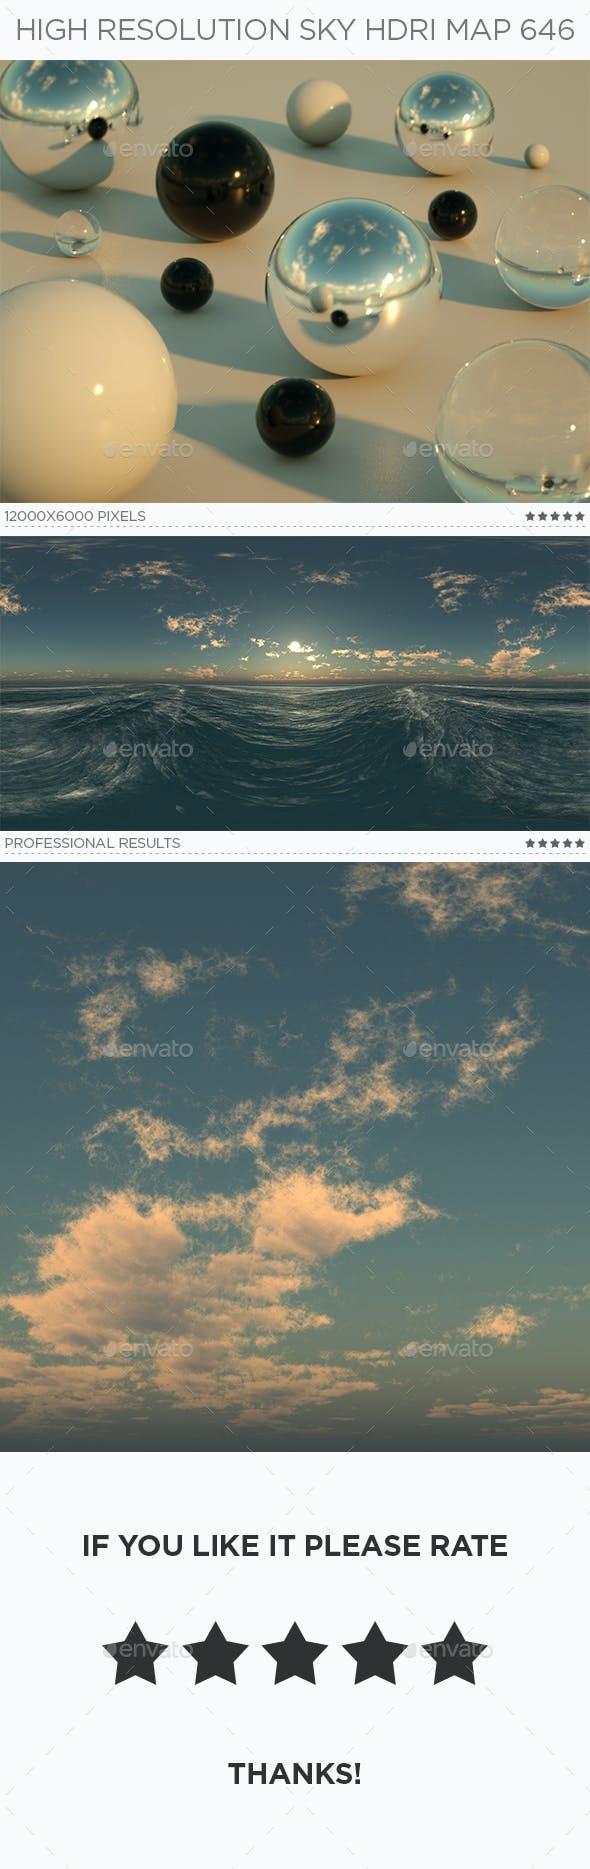 High Resolution Sky HDRi Map 646 - 3DOcean Item for Sale